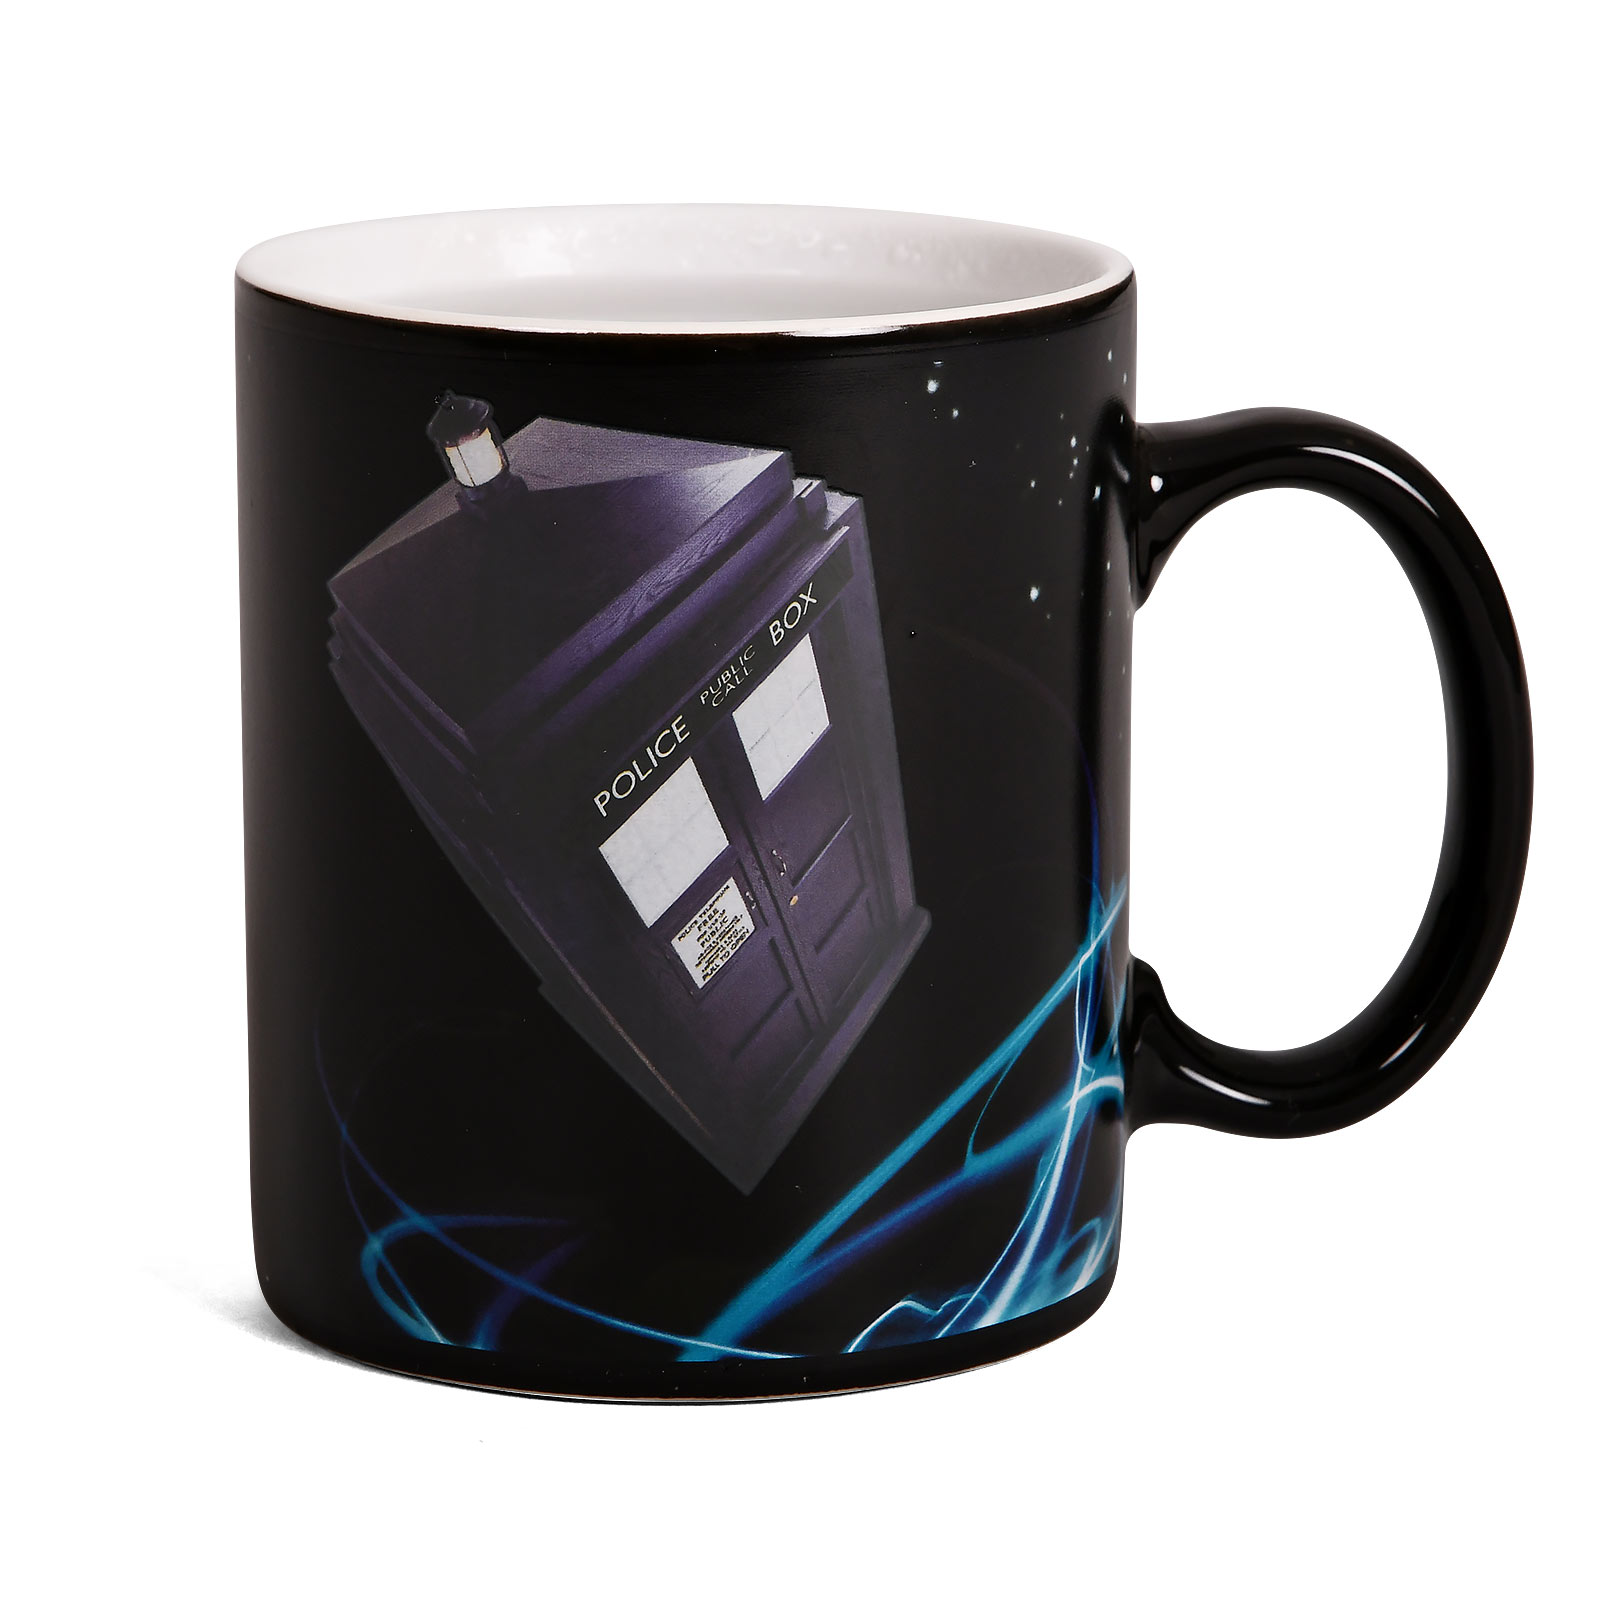 Doctor Who - Tardis Thermoeffekt Tasse